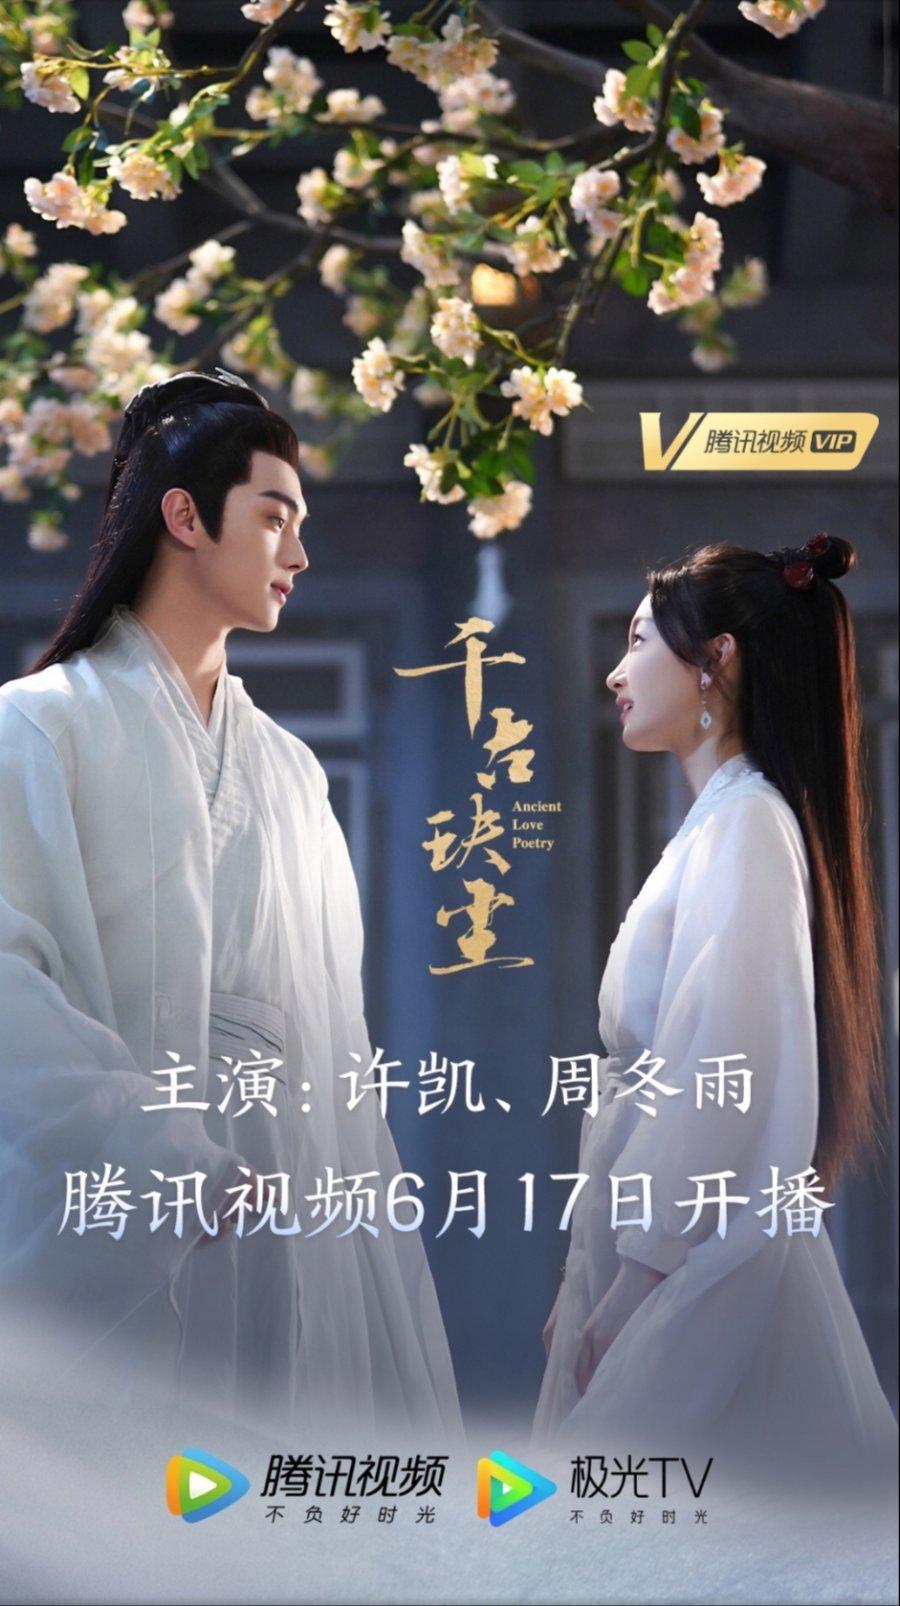 ancient-love-poetry-ซับไทย-ep-1-49